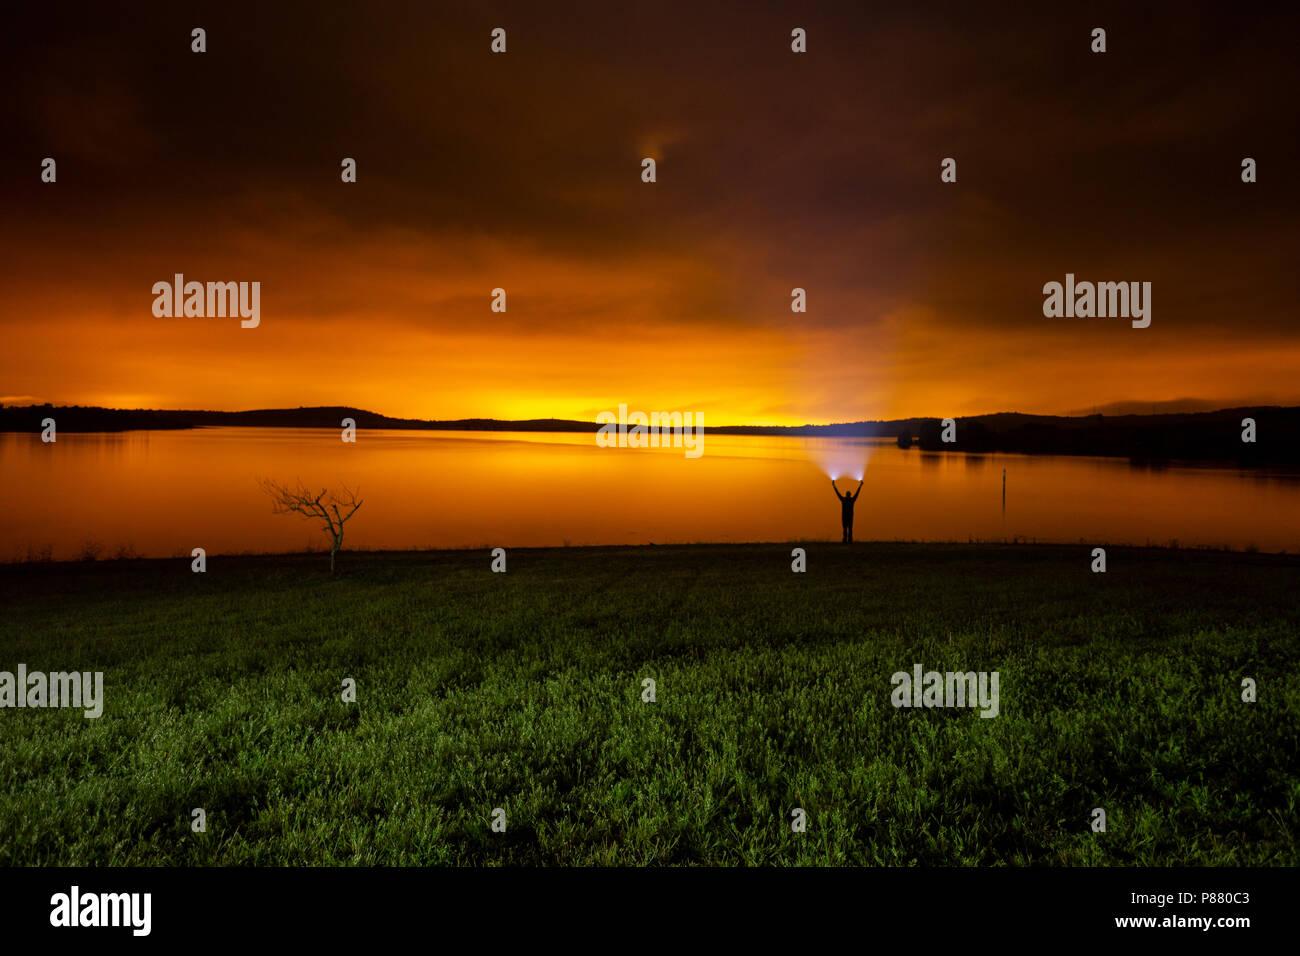 Luminic pollution from Vitoria at night in Ullibarri-Gamboa - Stock Image